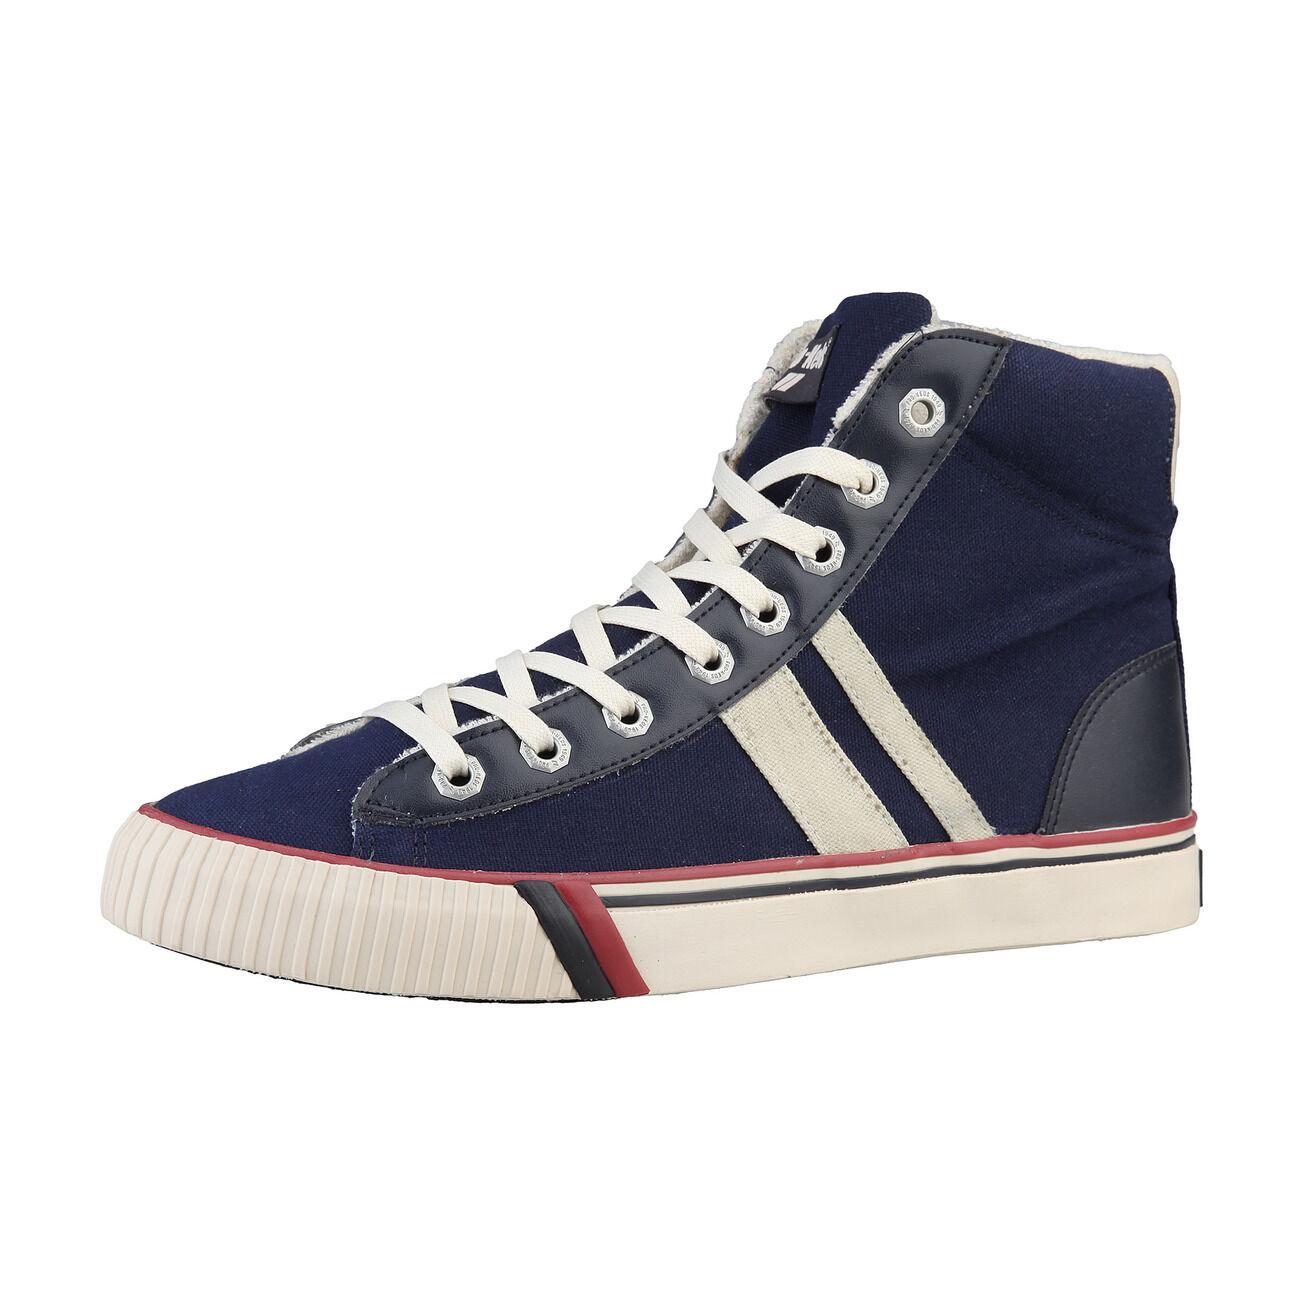 Keds ROYAL PLUS HI TOP pmc46972 Scarpe Uomo Sneakers Scarpe da ginnastica, Navy Scarpe classiche da uomo